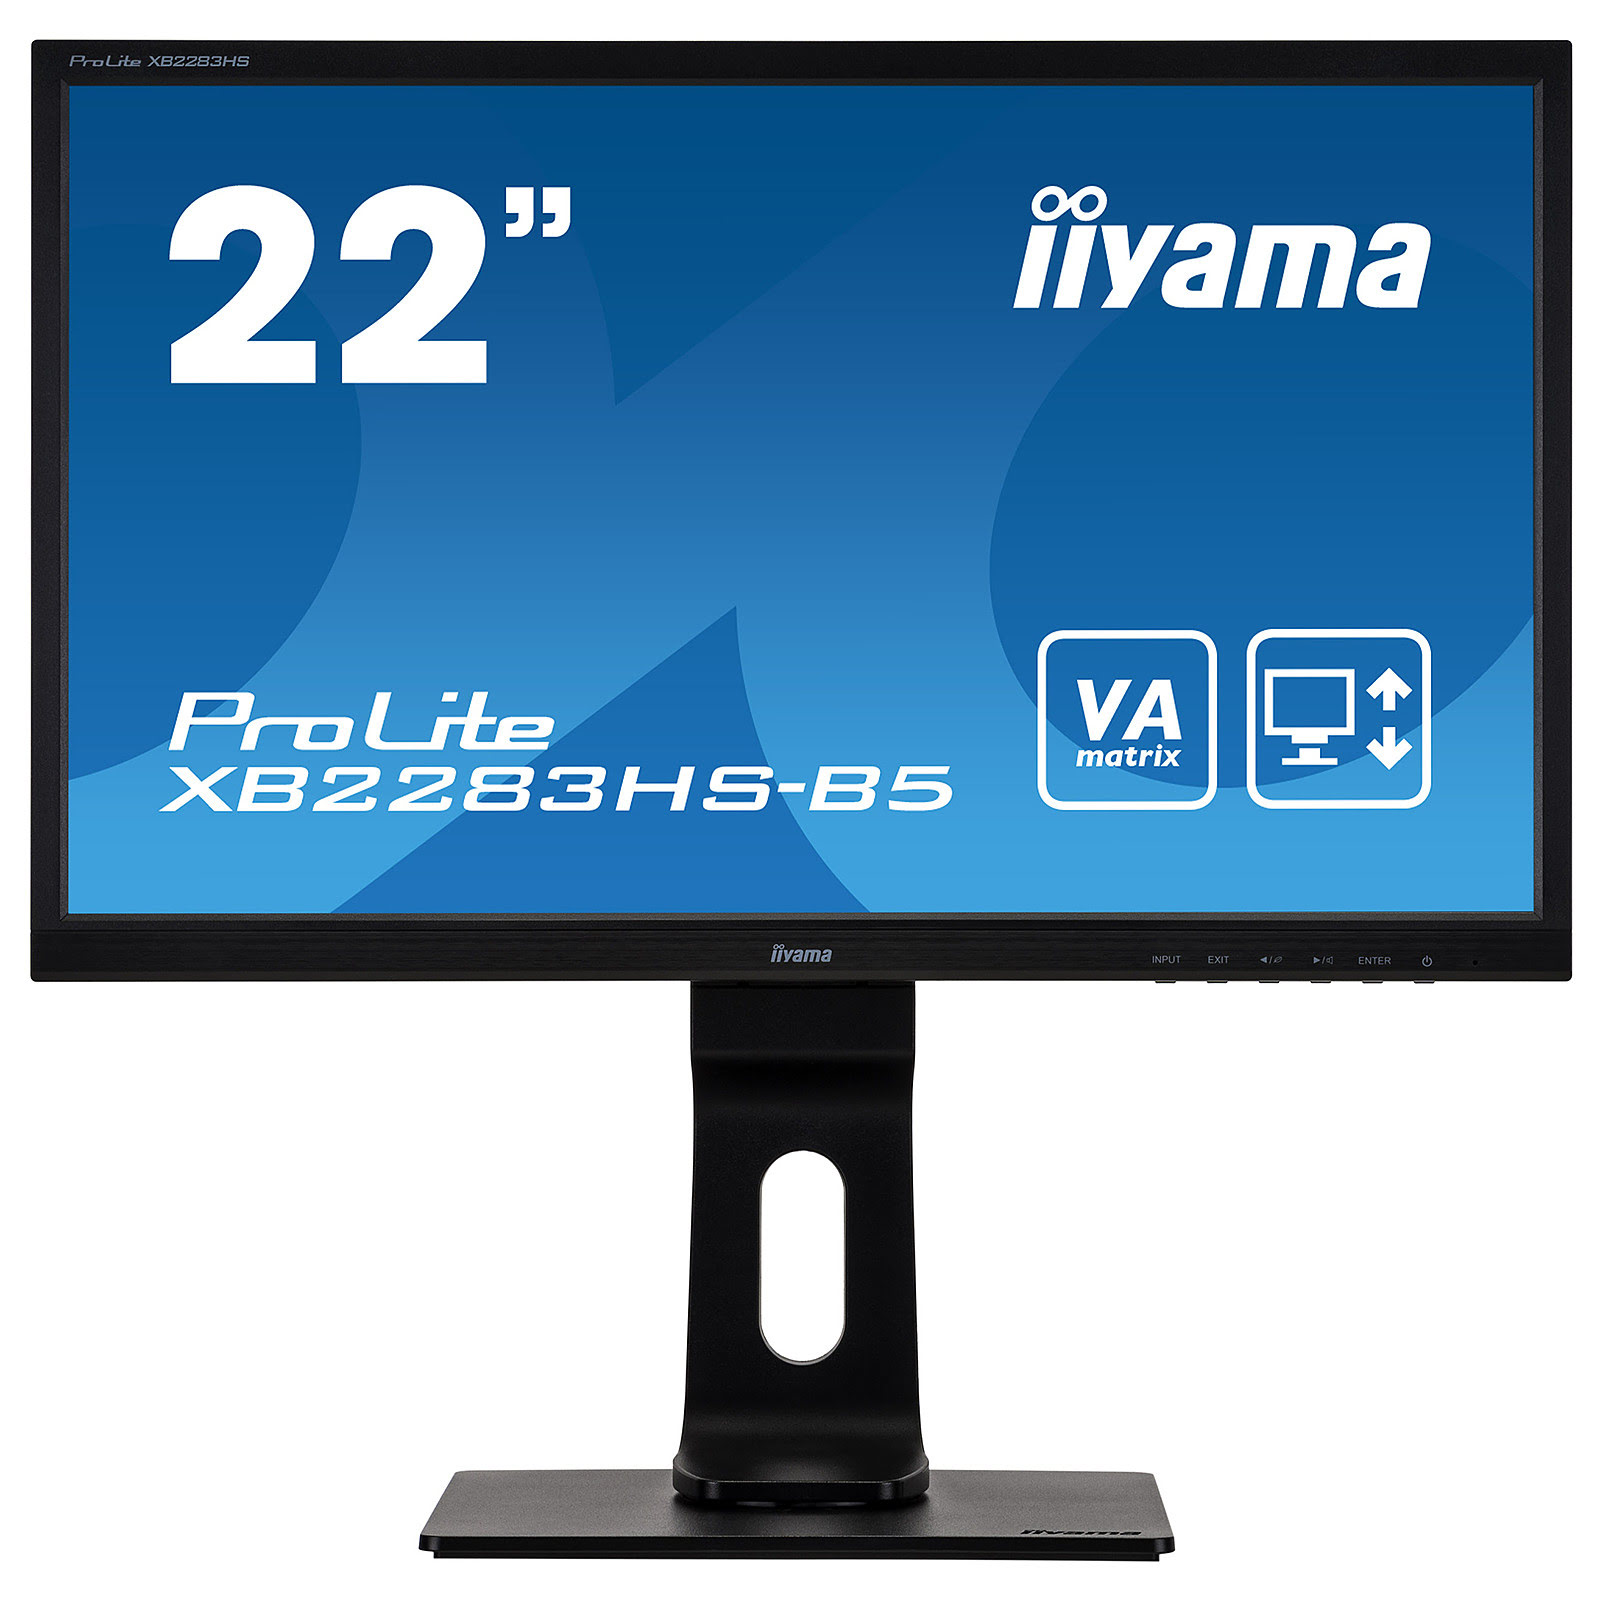 "Iiyama 22""  XB2283HS-B5 - Ecran PC Iiyama - Cybertek.fr - 0"